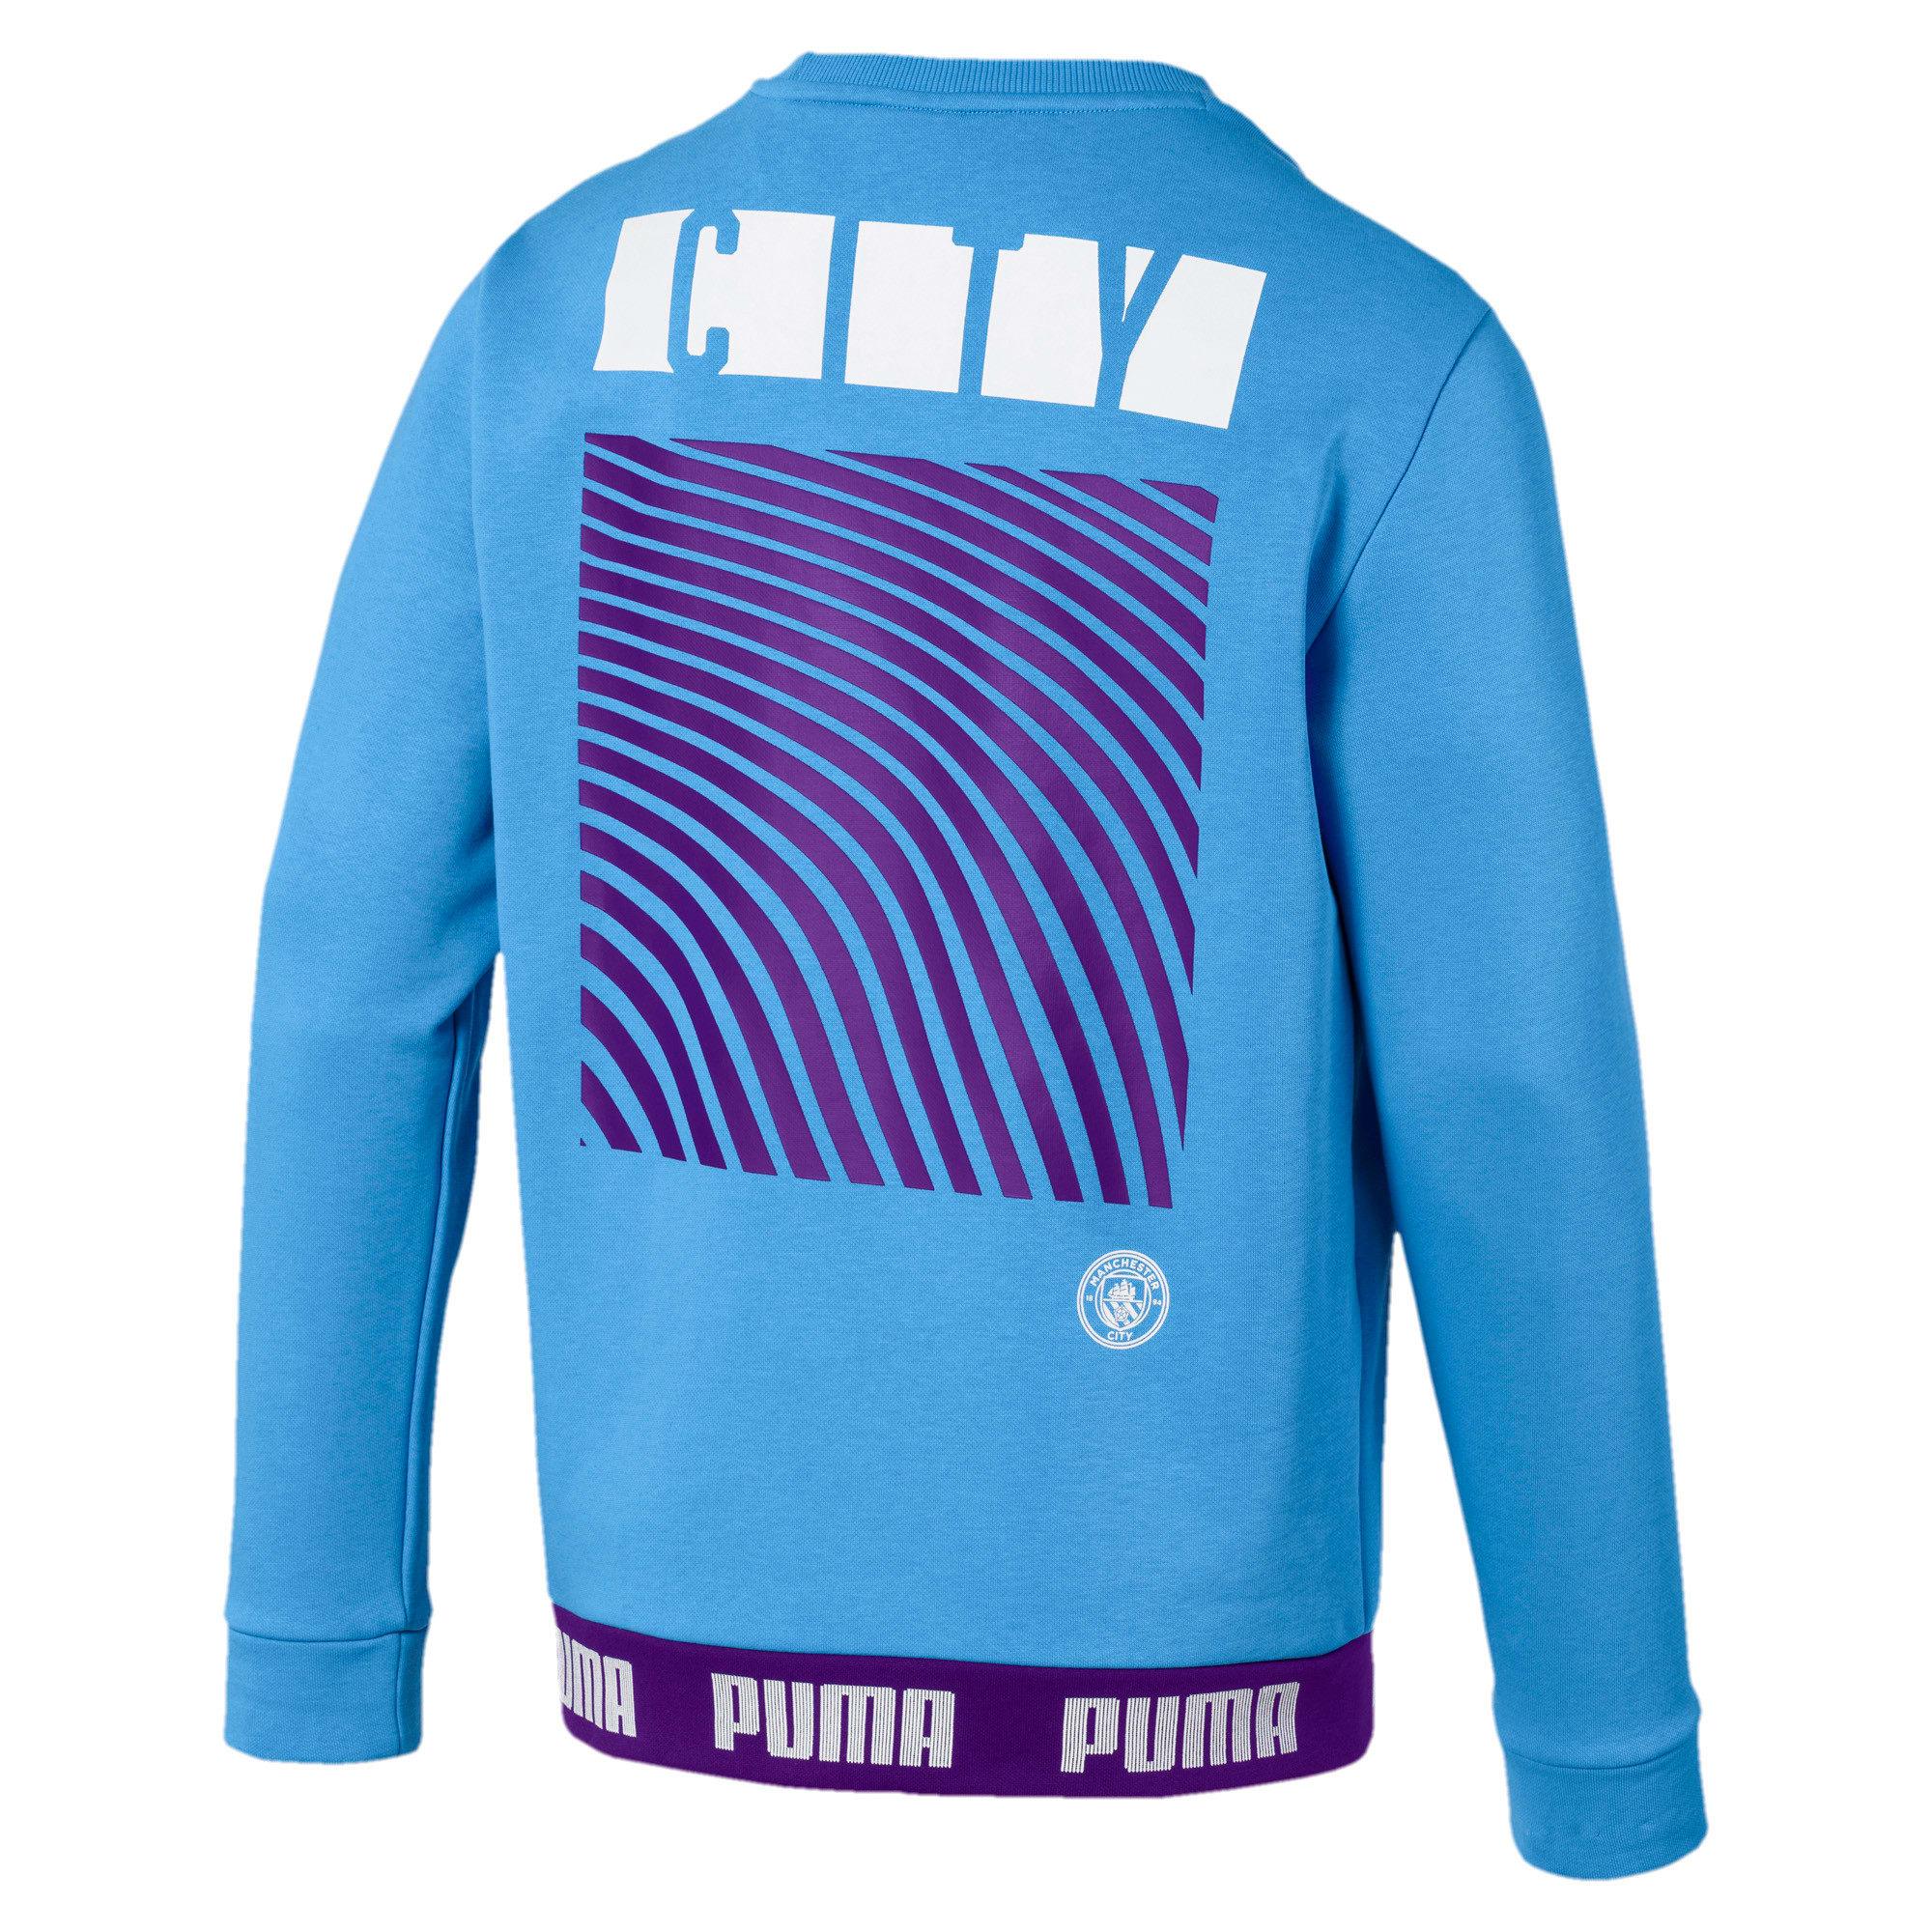 Thumbnail 2 of Man City Men's Football Culture Sweater, Team Light Blue-Puma White, medium